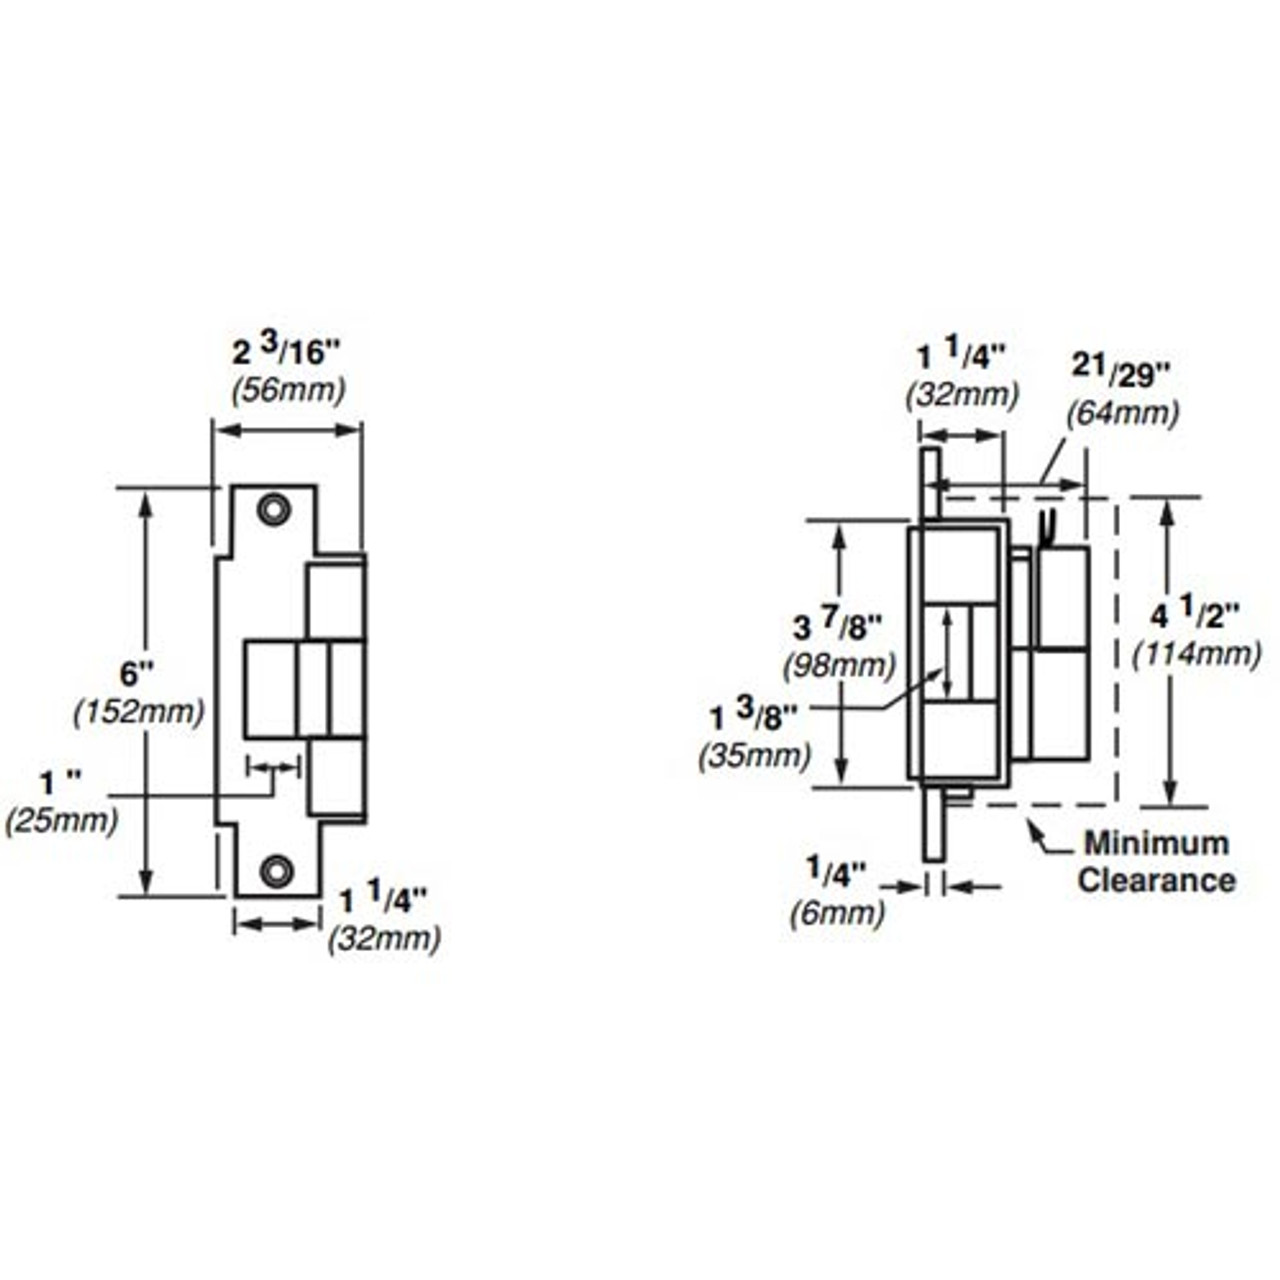 6213-24VDC-US10B Von Duprin Electric Strike for Mortise or Cylindrical Locksets in Dark Bronze Finish